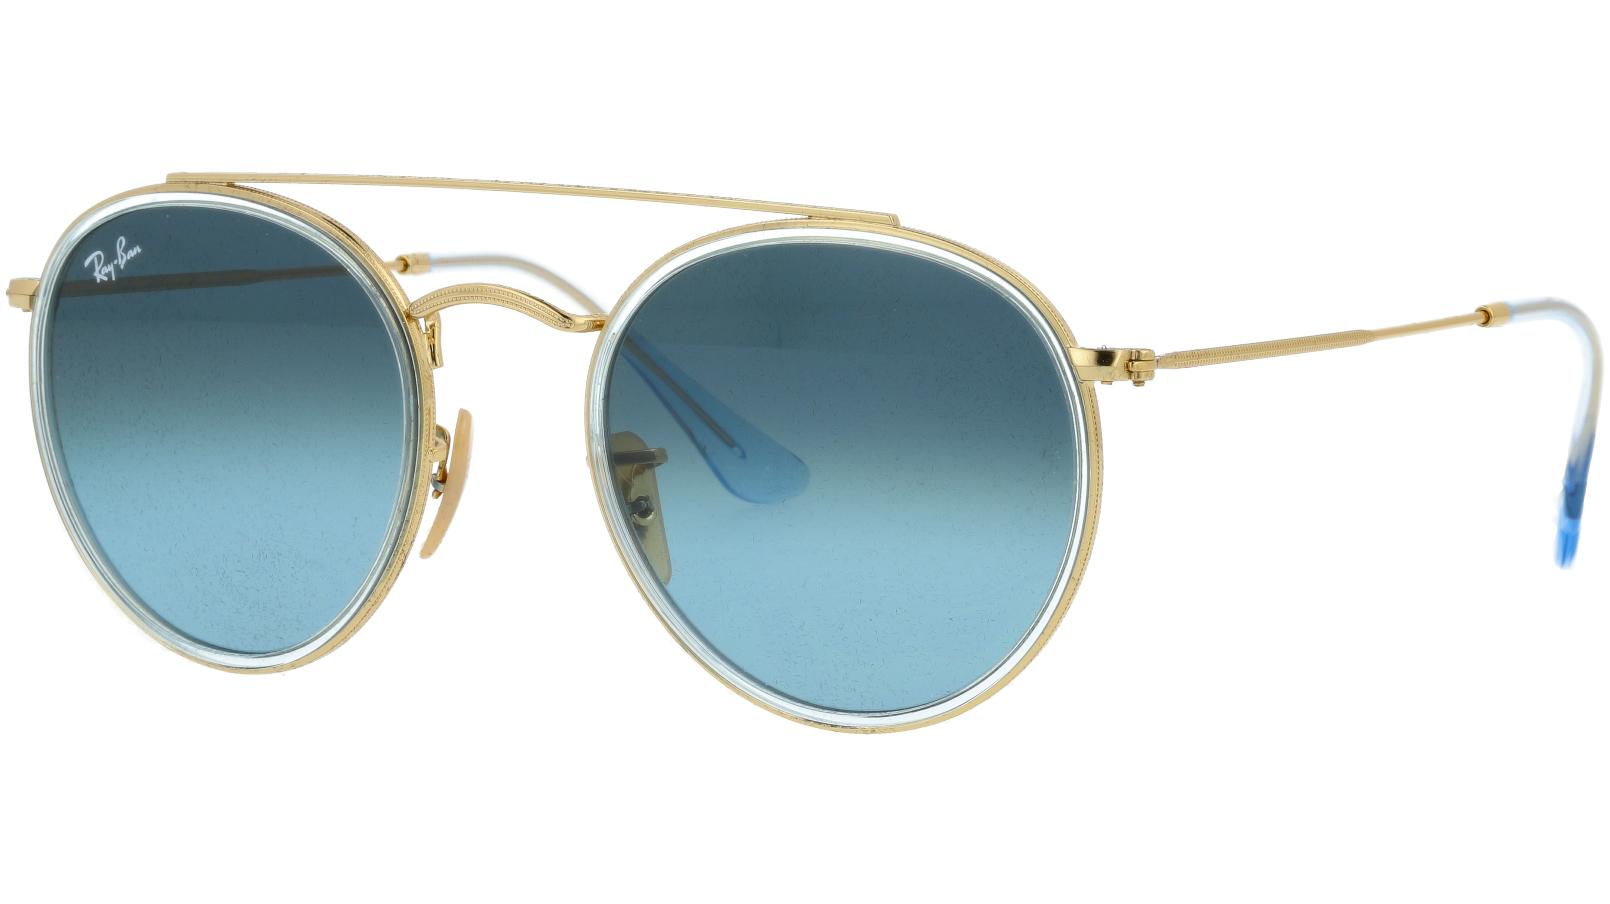 Ray-Ban RB3647N 91233M Arista Round Sunglasses